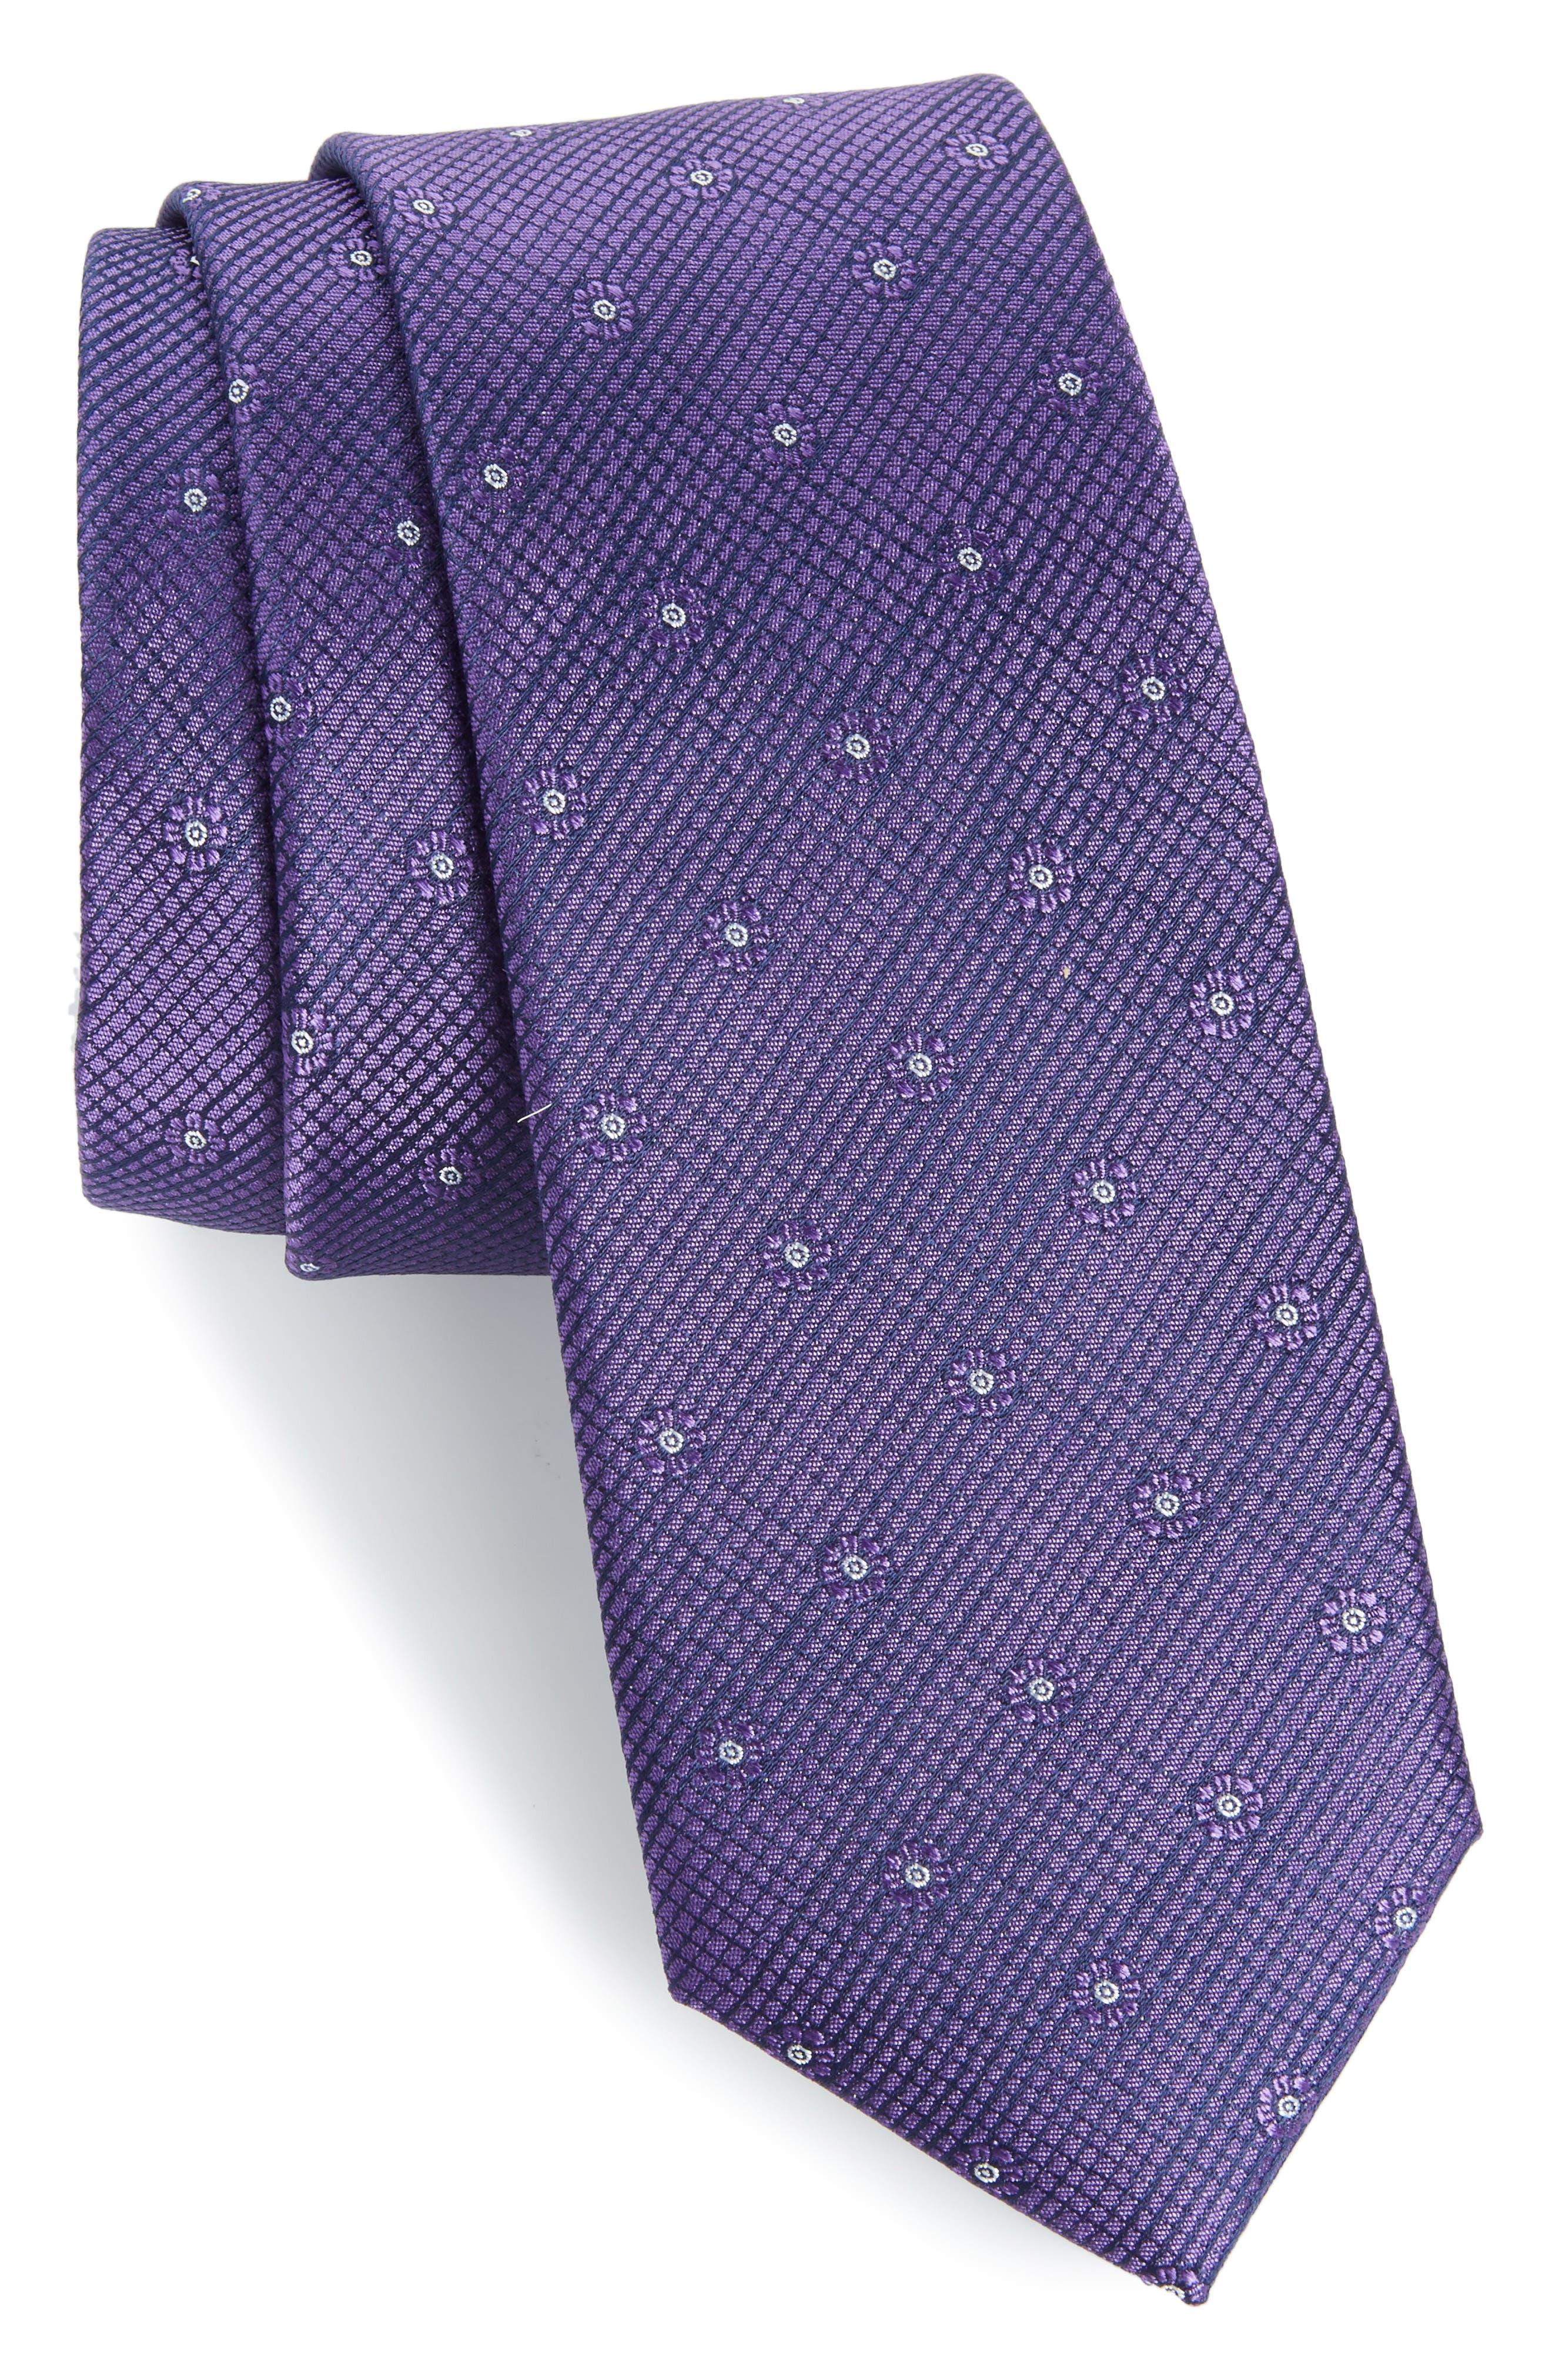 Fleur Medallion Silk Skinny Tie,                             Main thumbnail 1, color,                             Purple